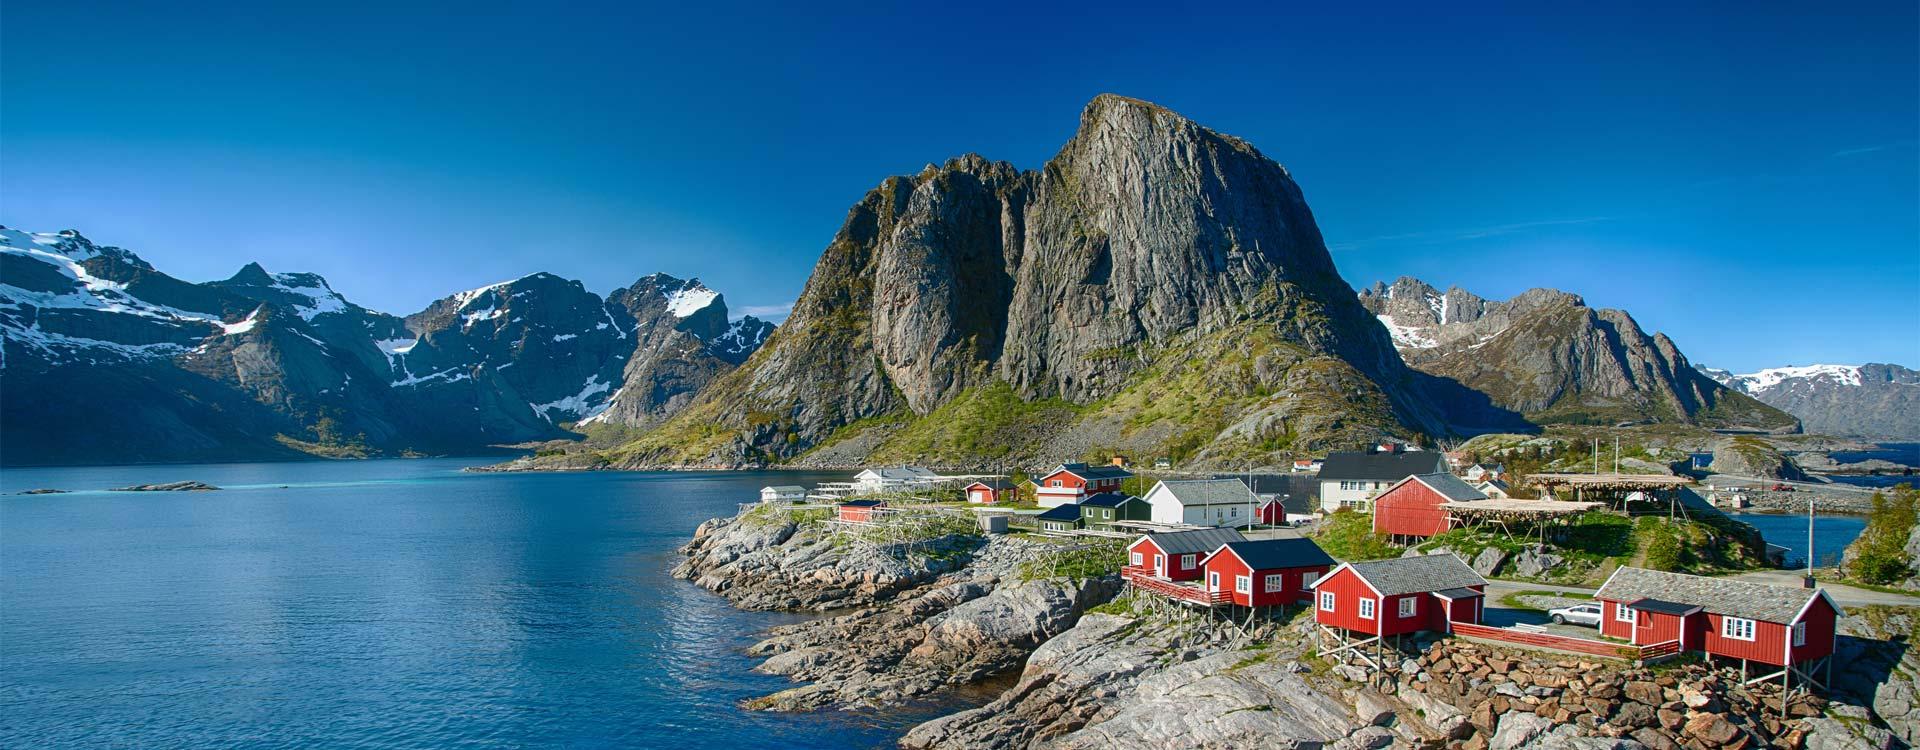 Adventure holidays - the Lofoten Islands